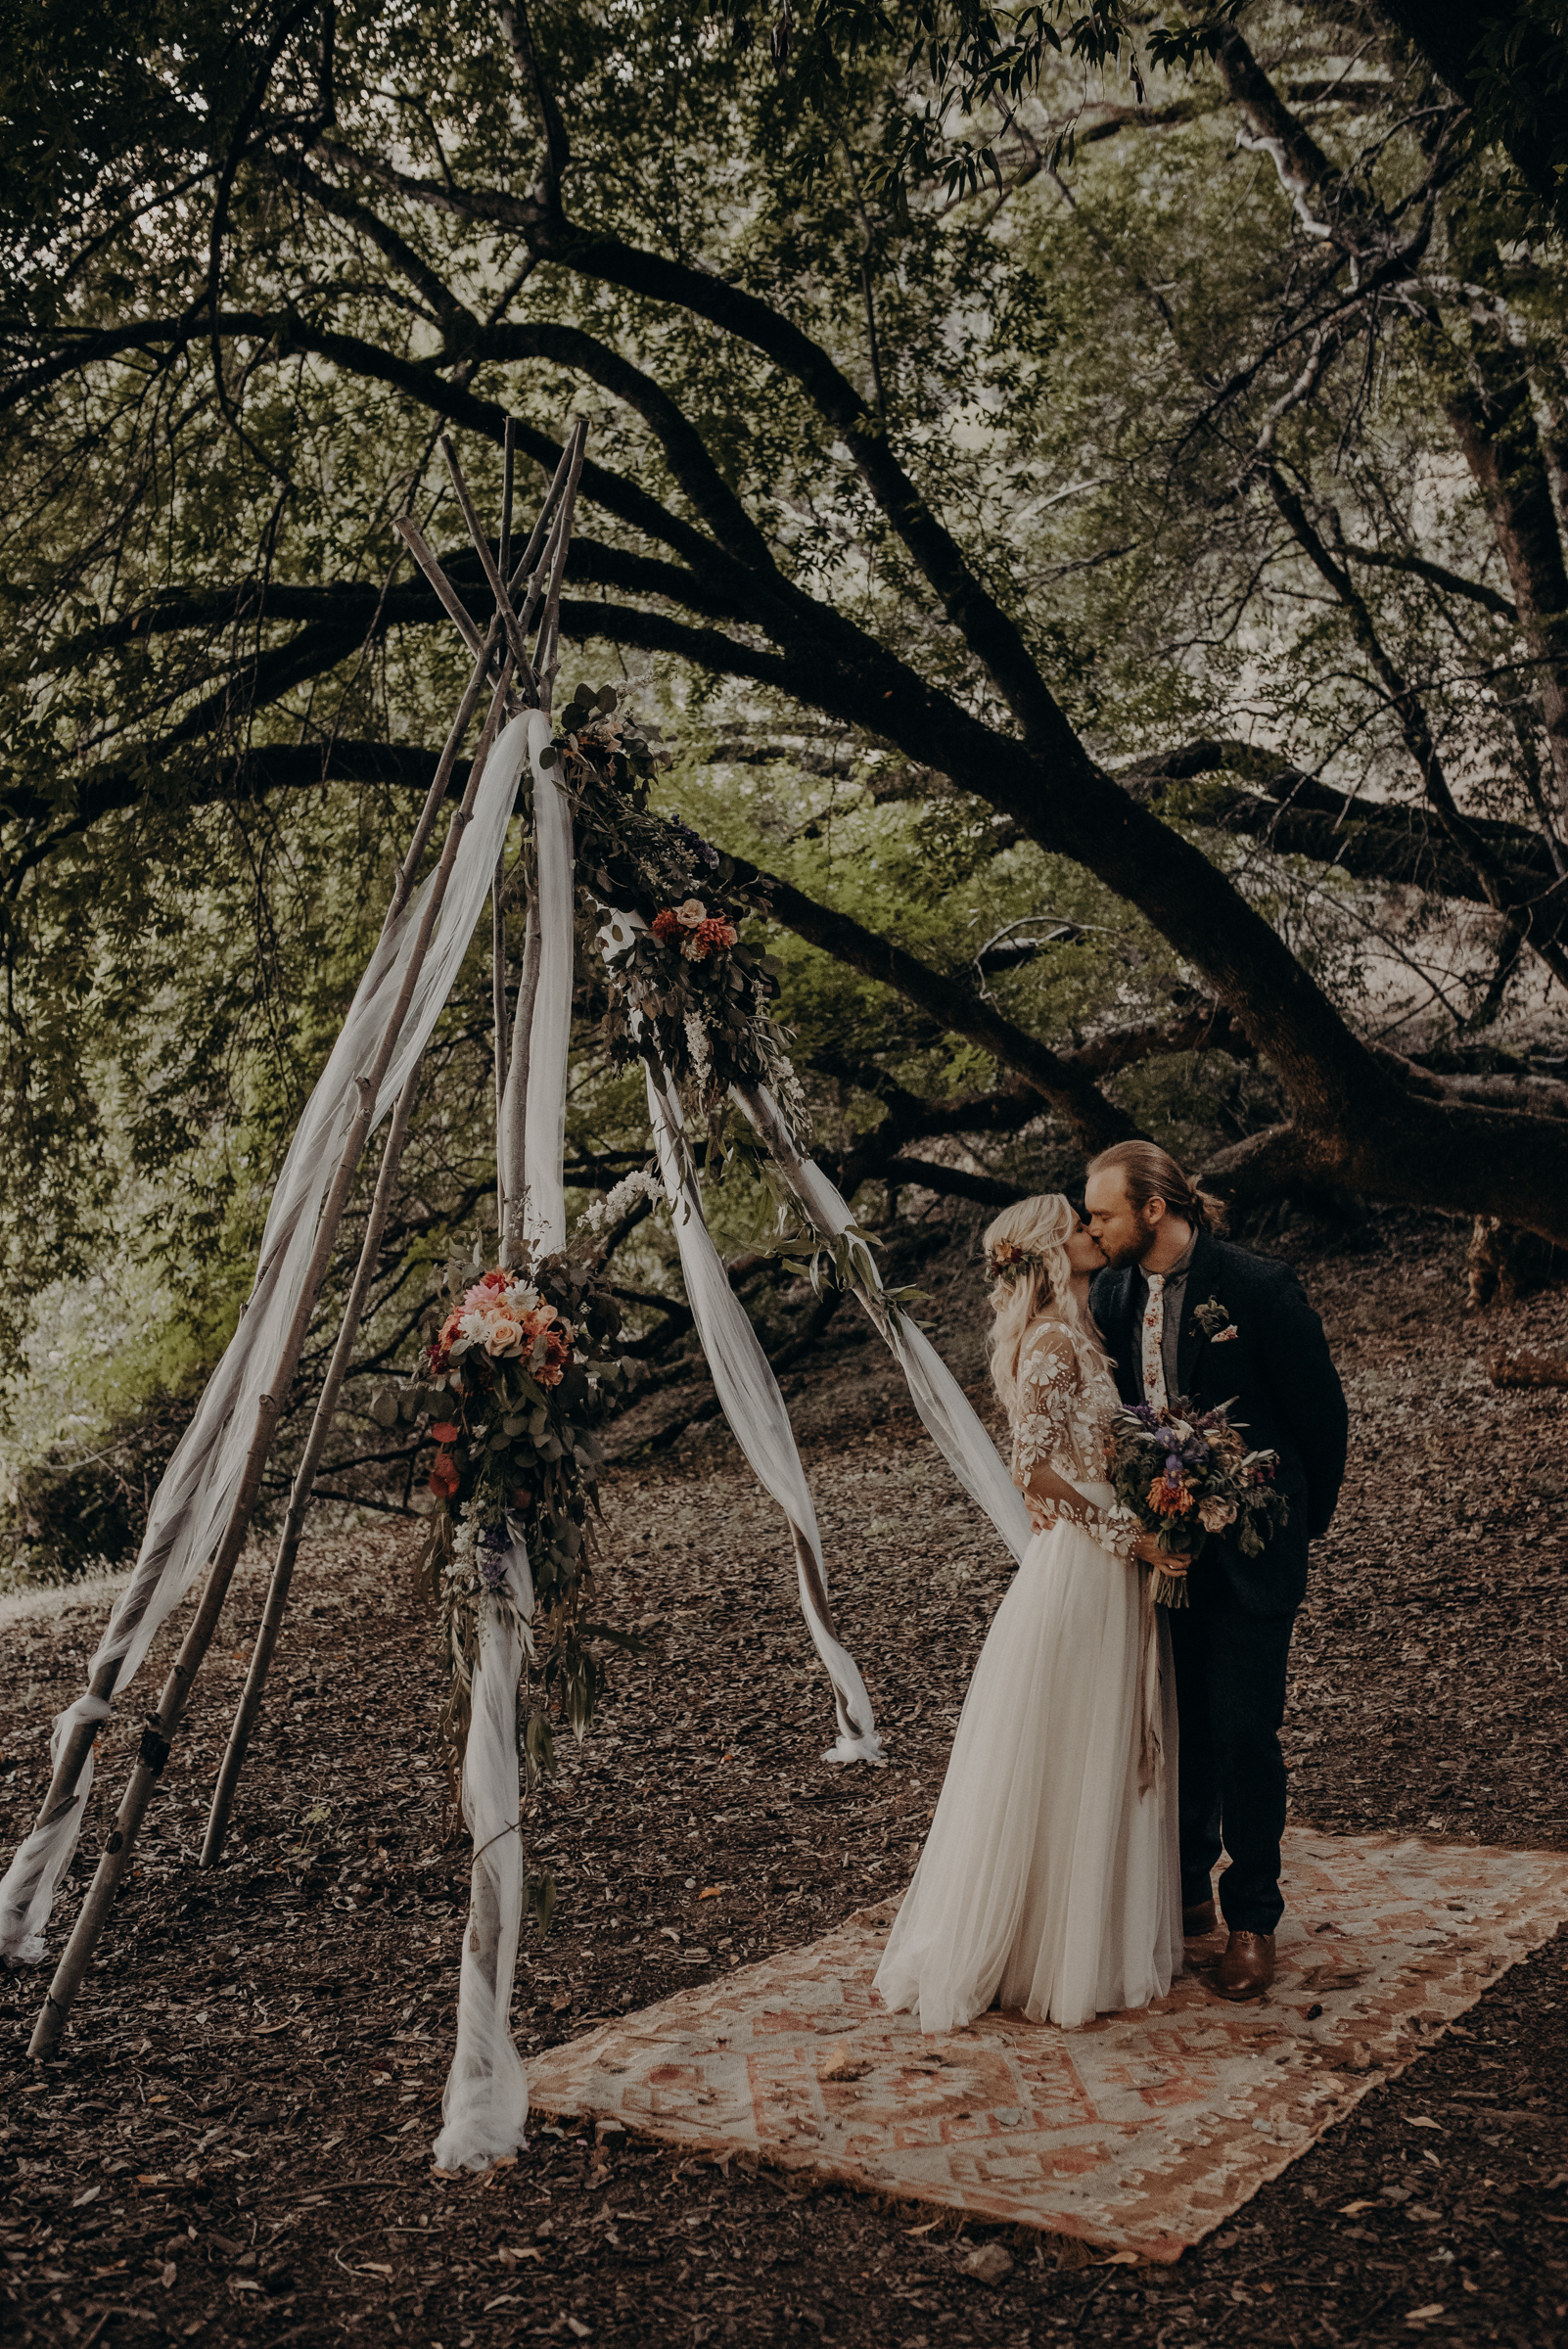 IsaiahAndTaylor.com - California Destination Elopement, Lake Leonard Reserve Wedding, Ukiah-126.jpg